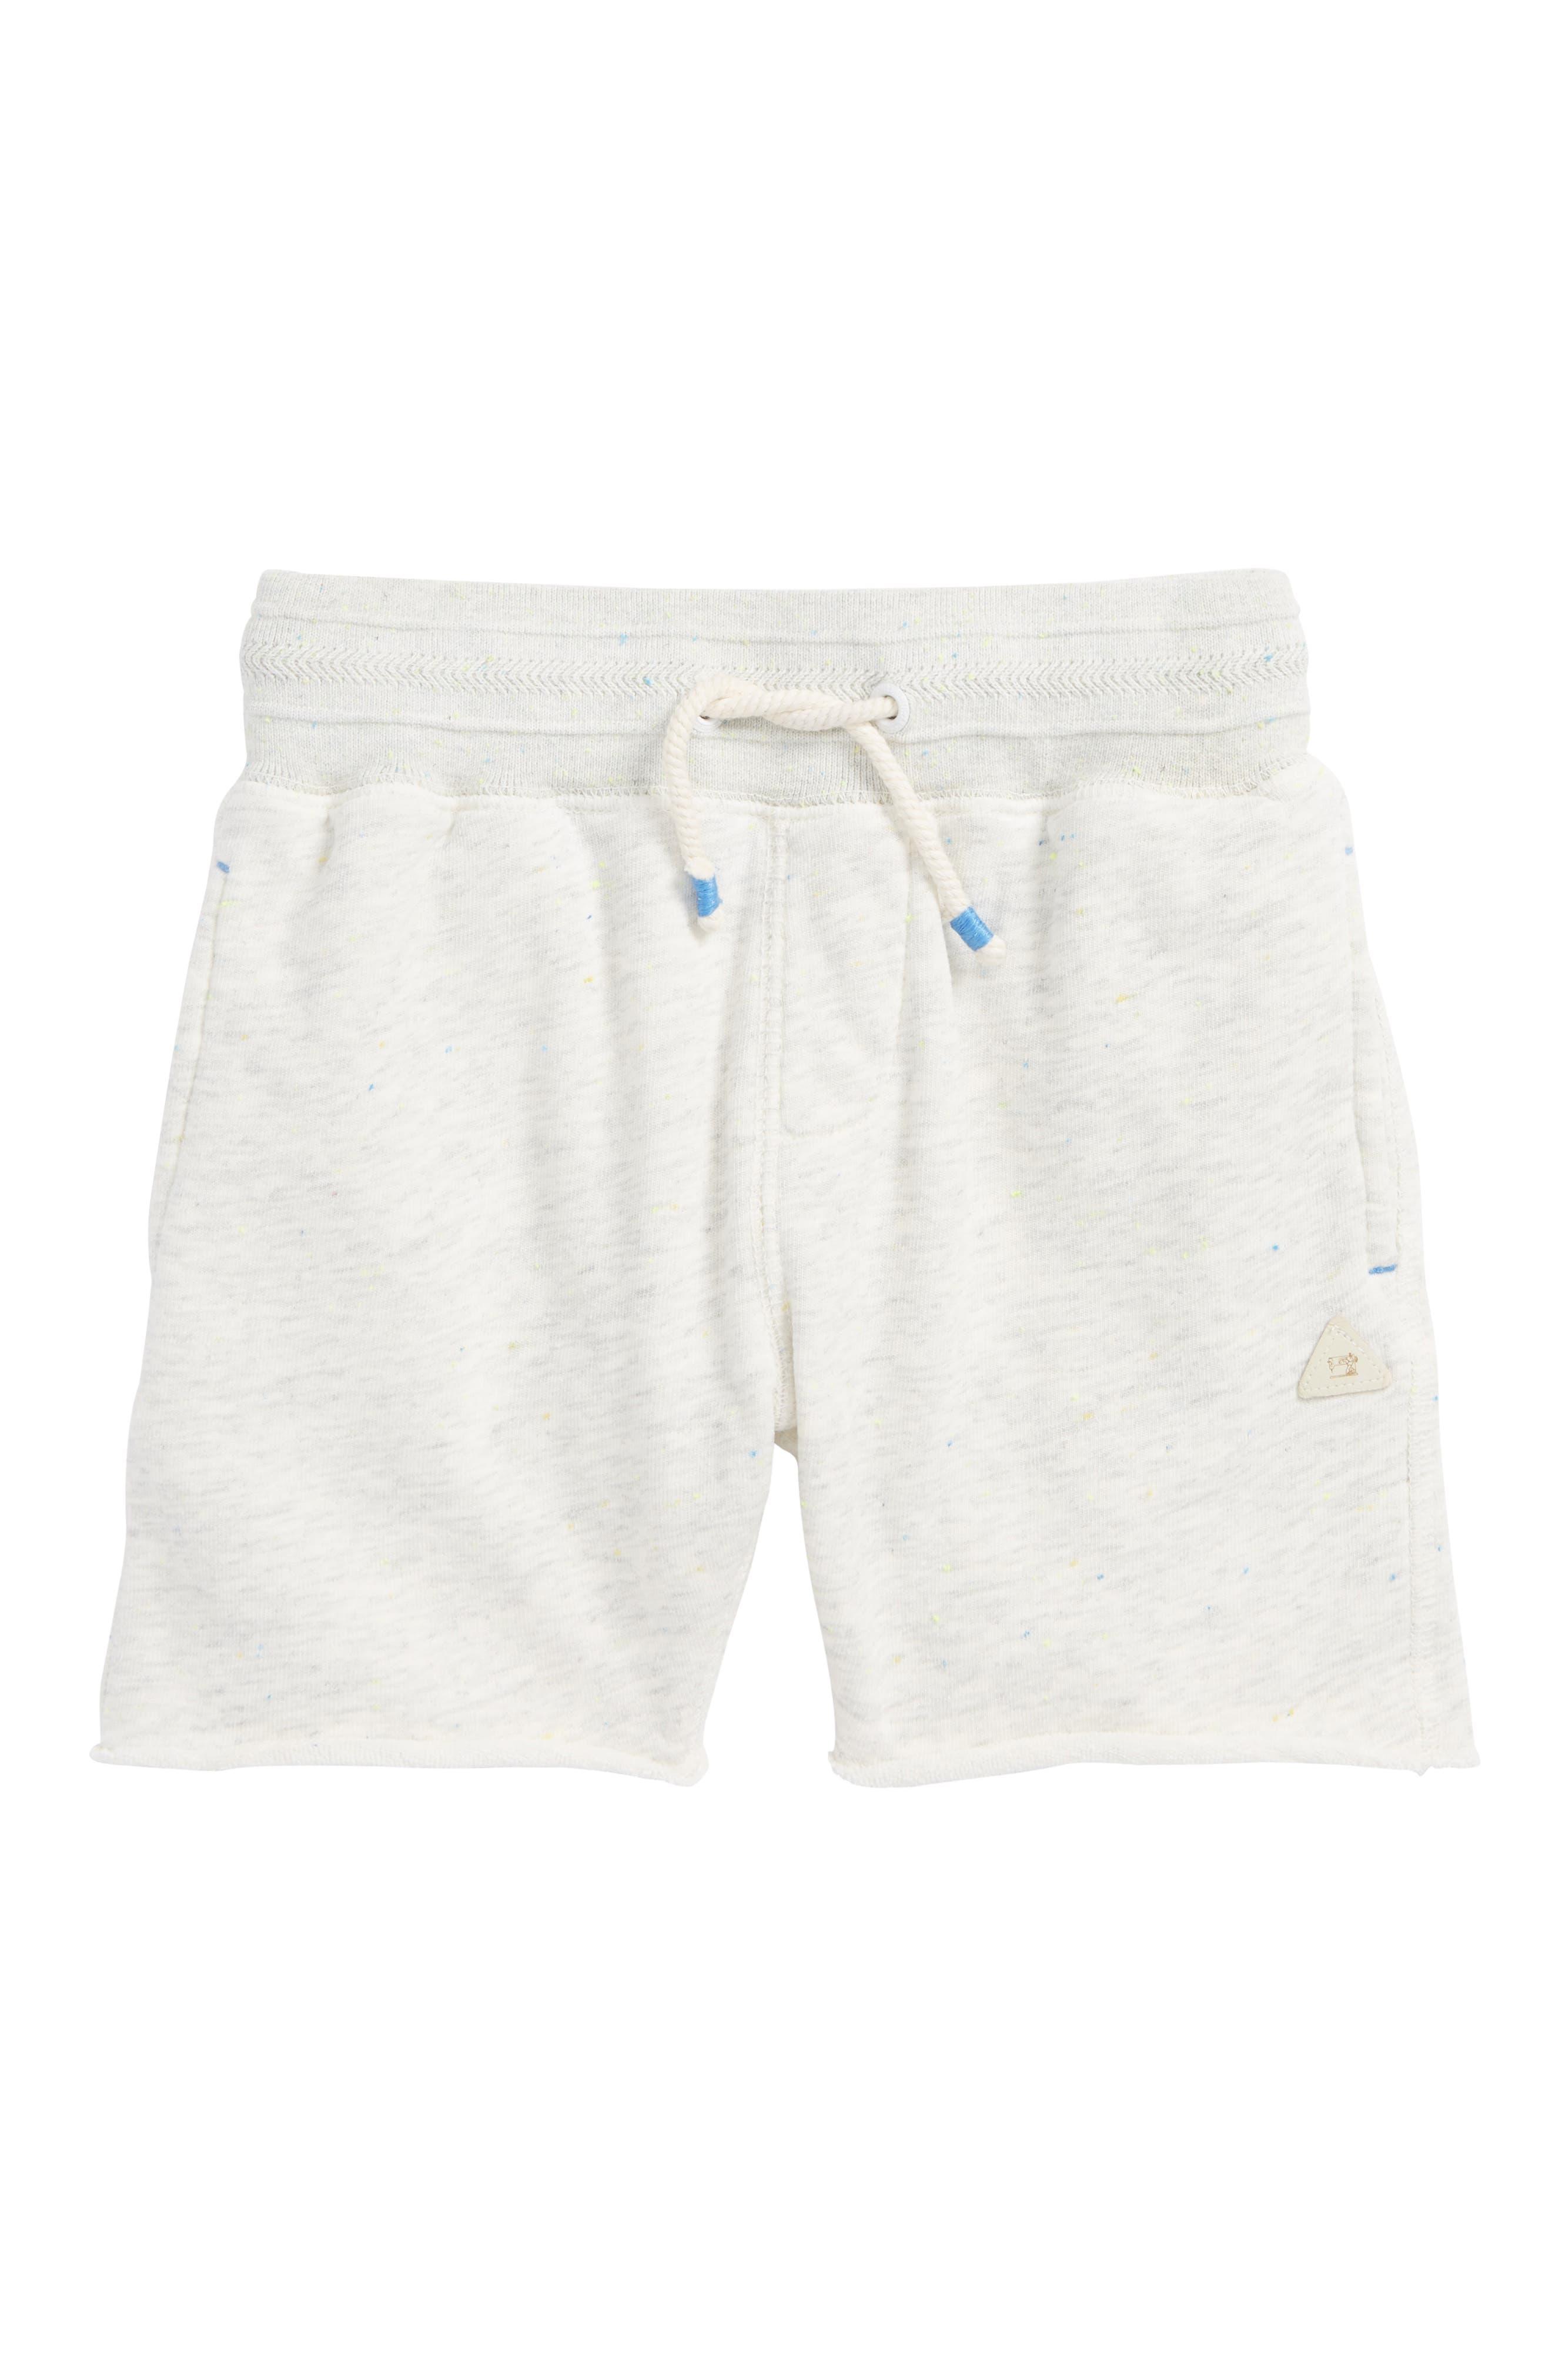 Pool Side Knit Shorts,                             Main thumbnail 1, color,                             Ecru